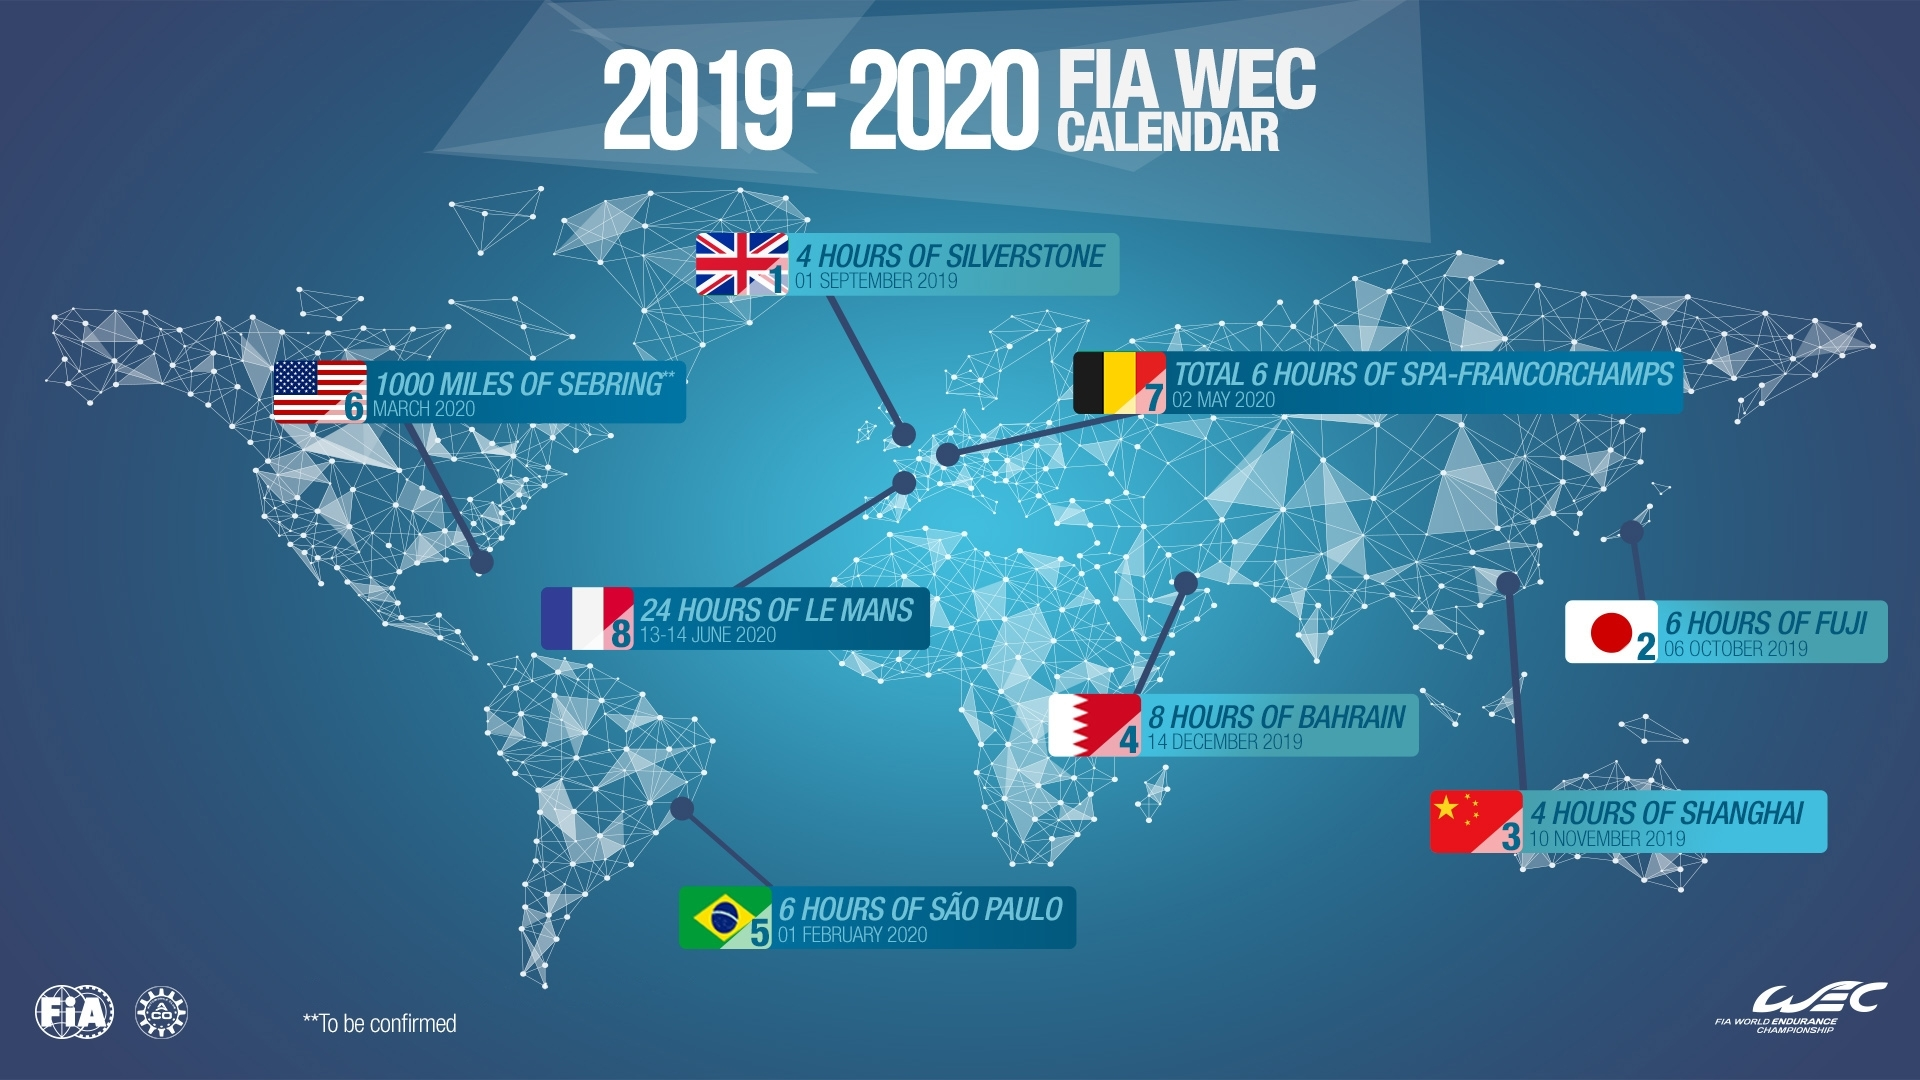 Wec - 2019/2020 Fia Wec Calendar Is Approved | Federation